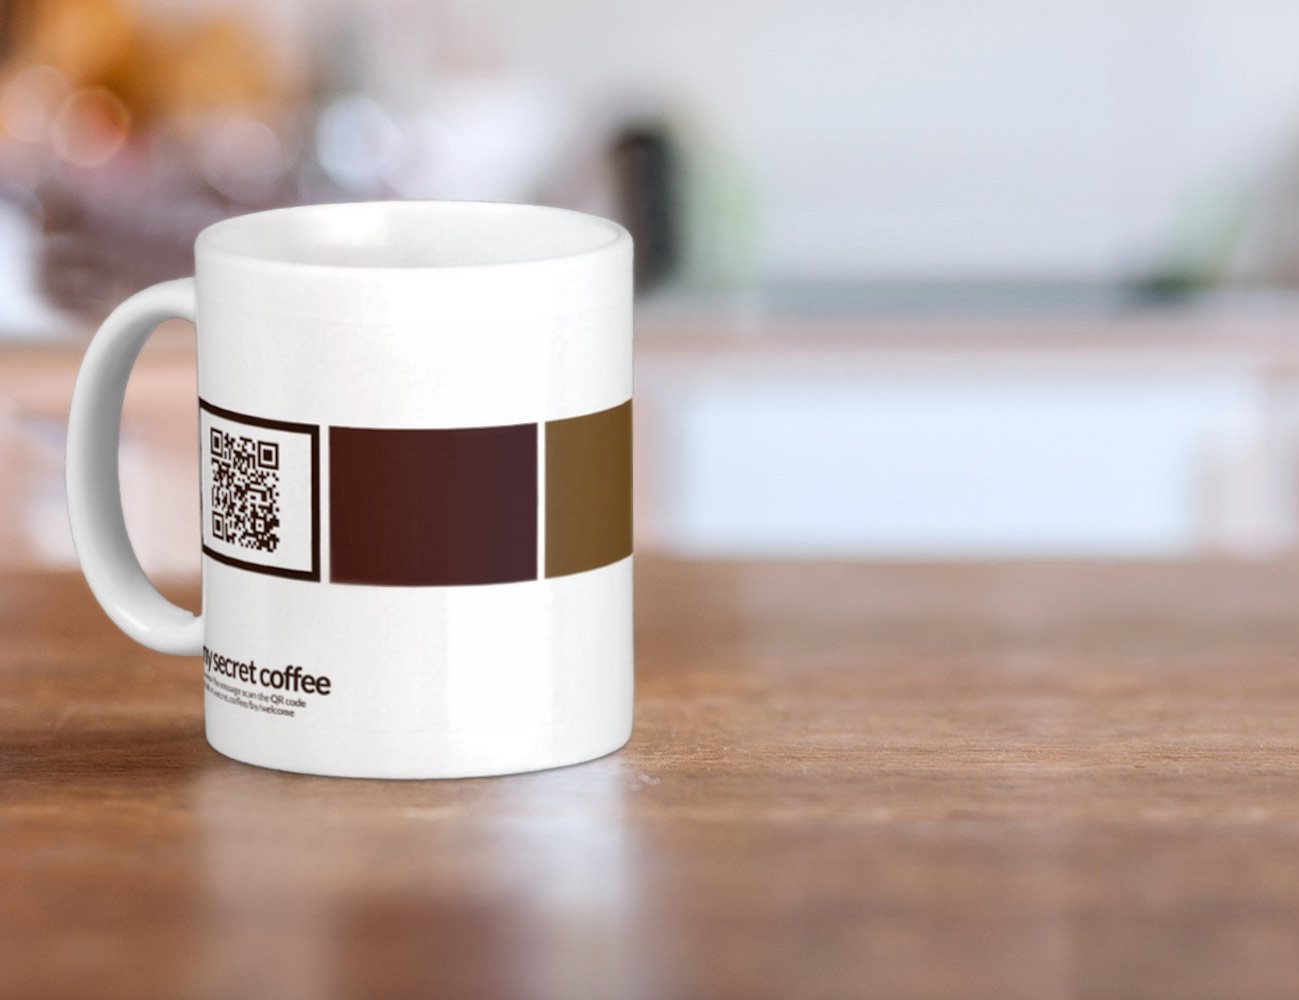 mysecret.coffee – Hide Your Message On A Coffee Mug